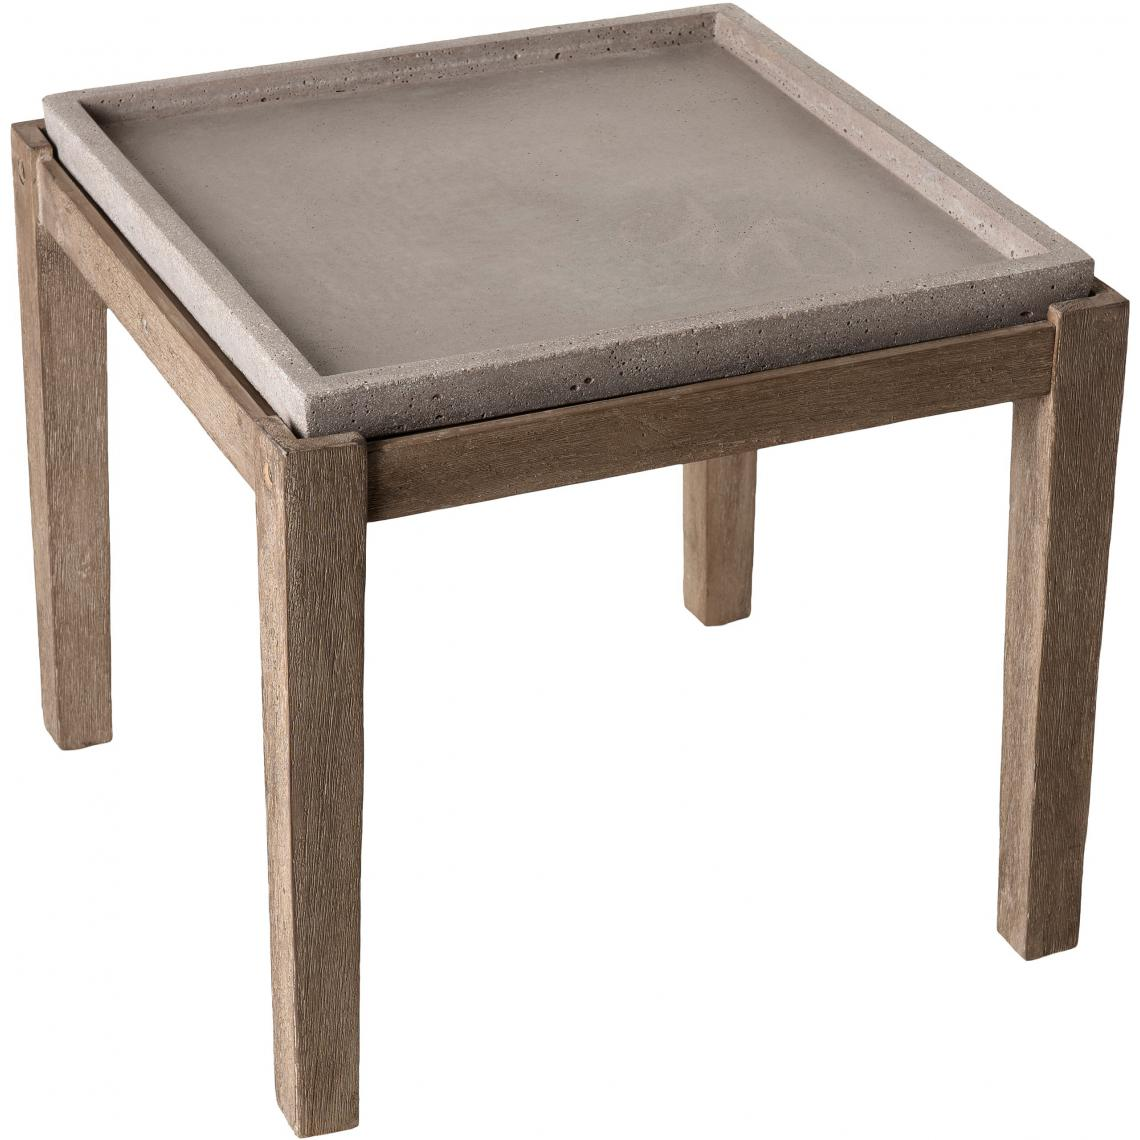 Table Basse Carree Plateau En Beton 53x53cm Pieds En Acacia